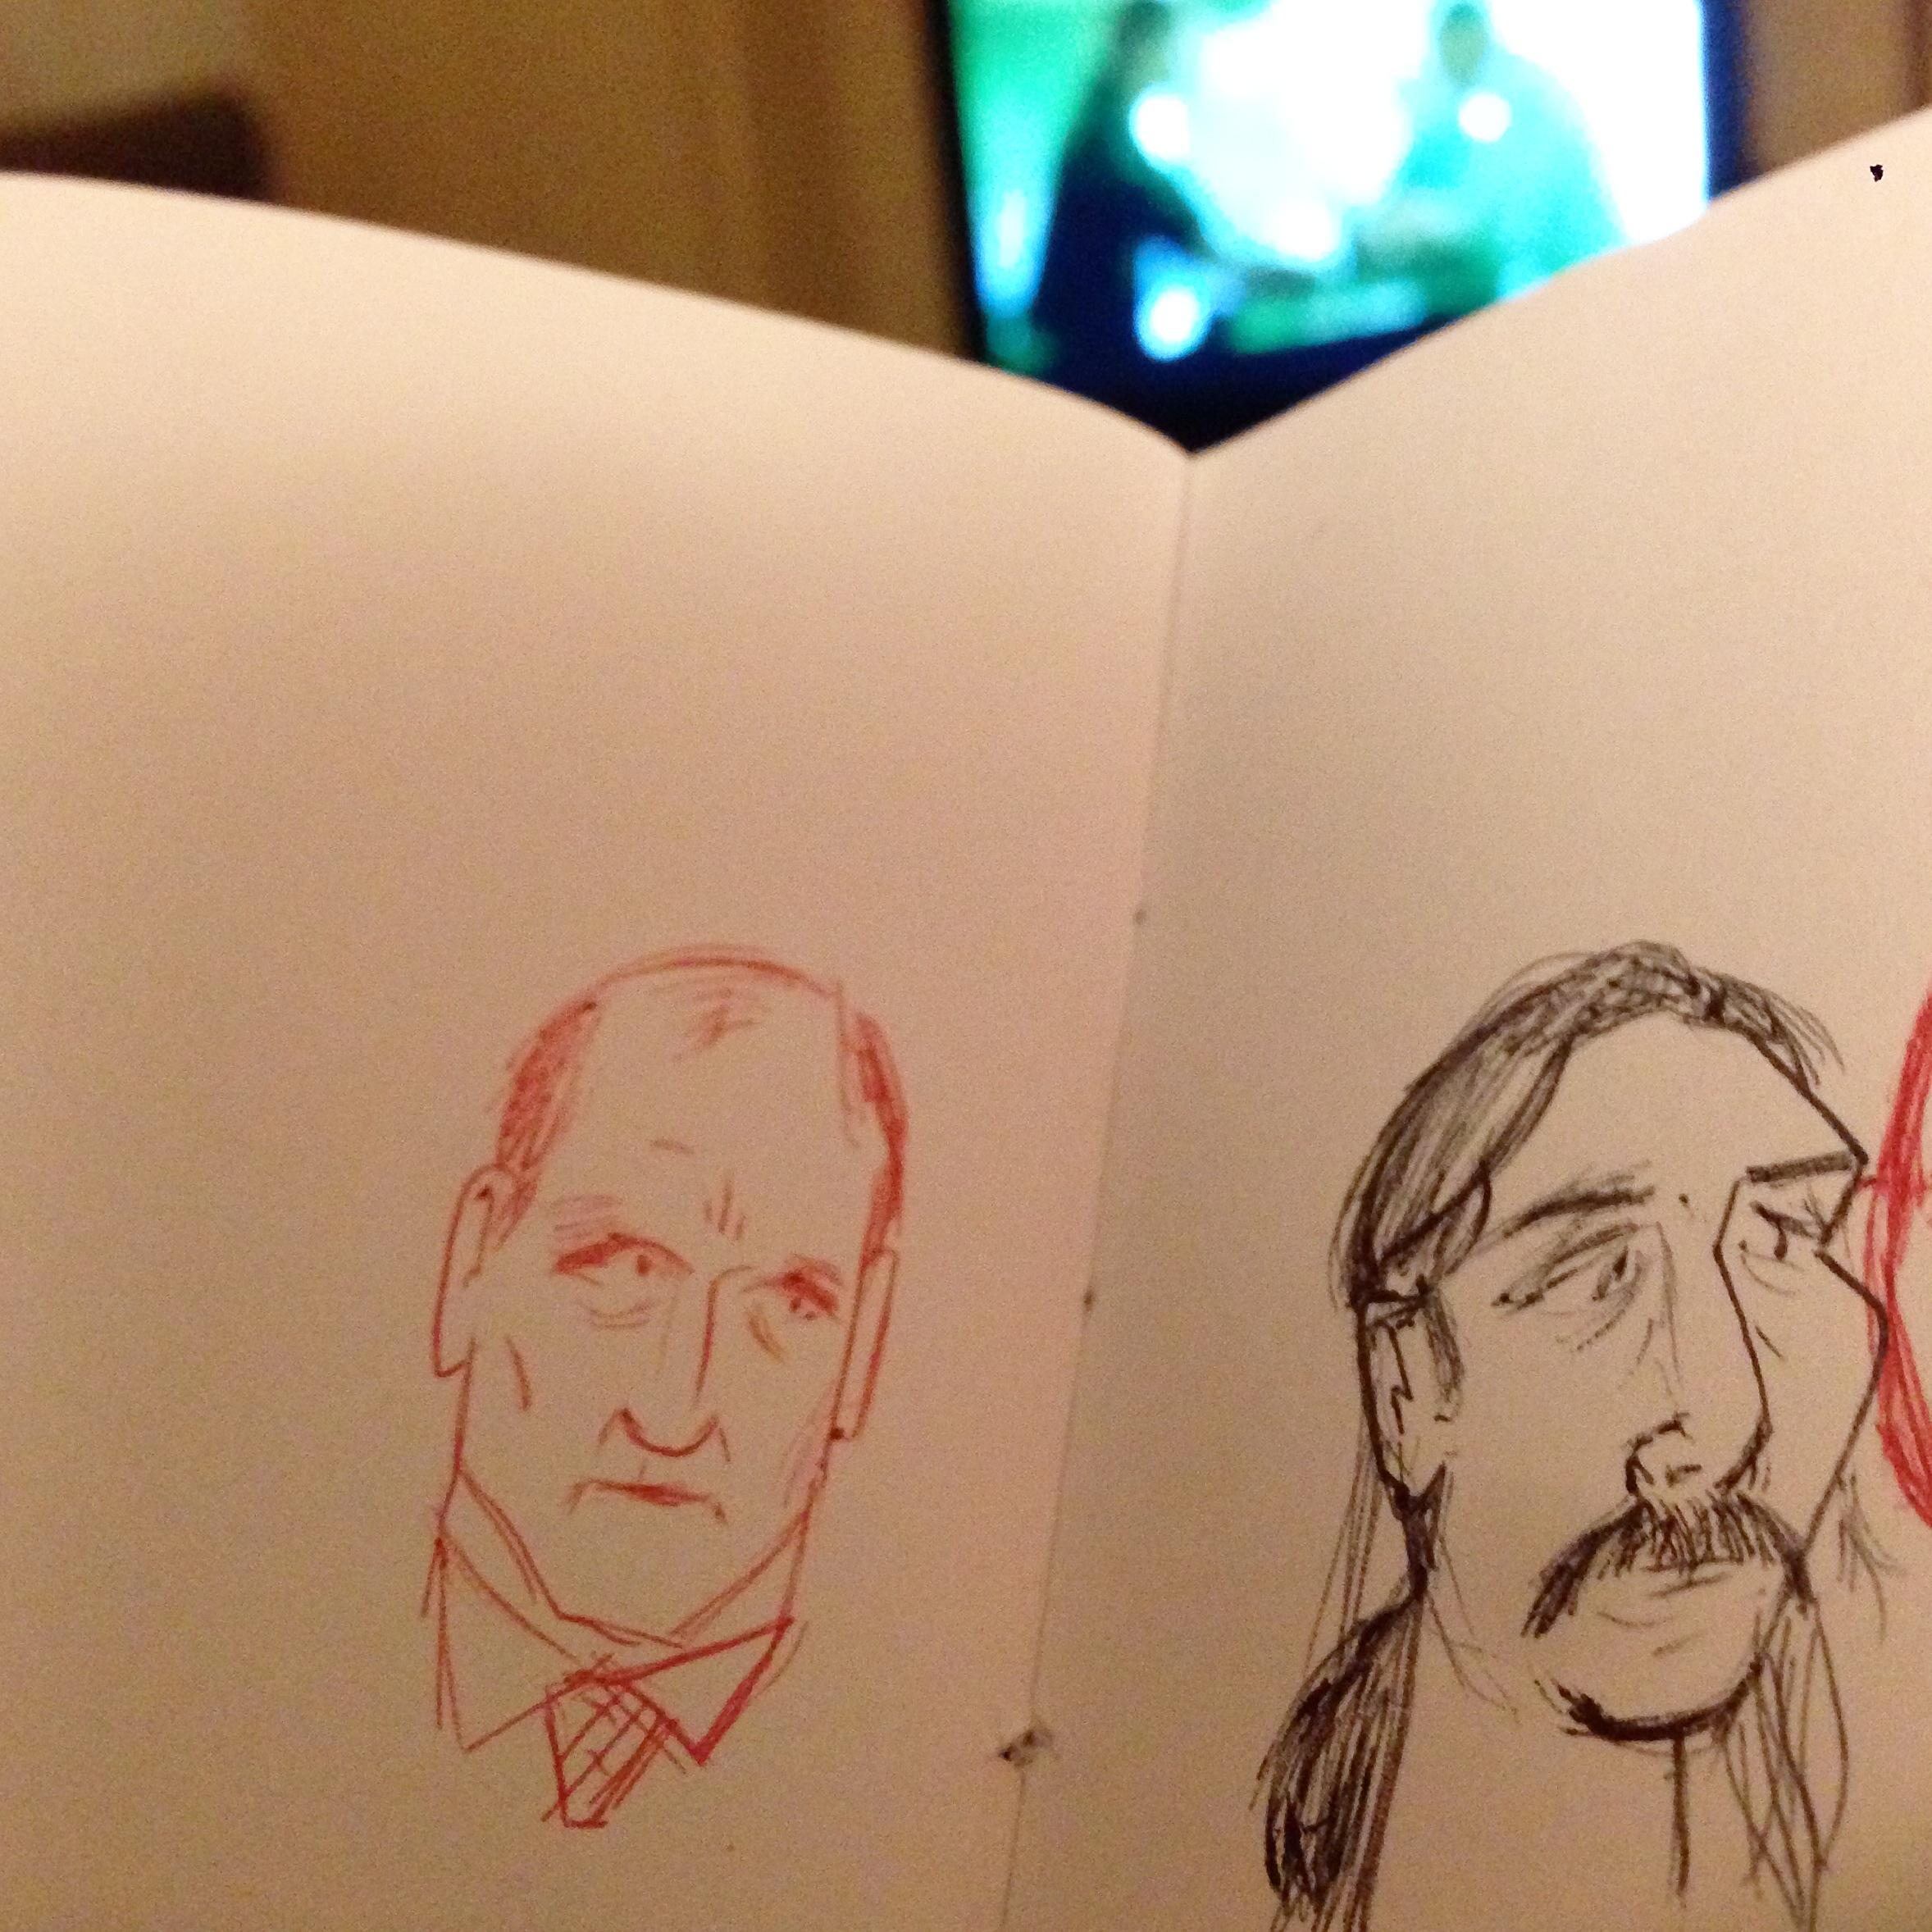 sketchbook sketch boceto cuaderno dibujo doodle garabato urban sketcher woody harrelson matthew mcconaughey true detective tv serie gripe flu